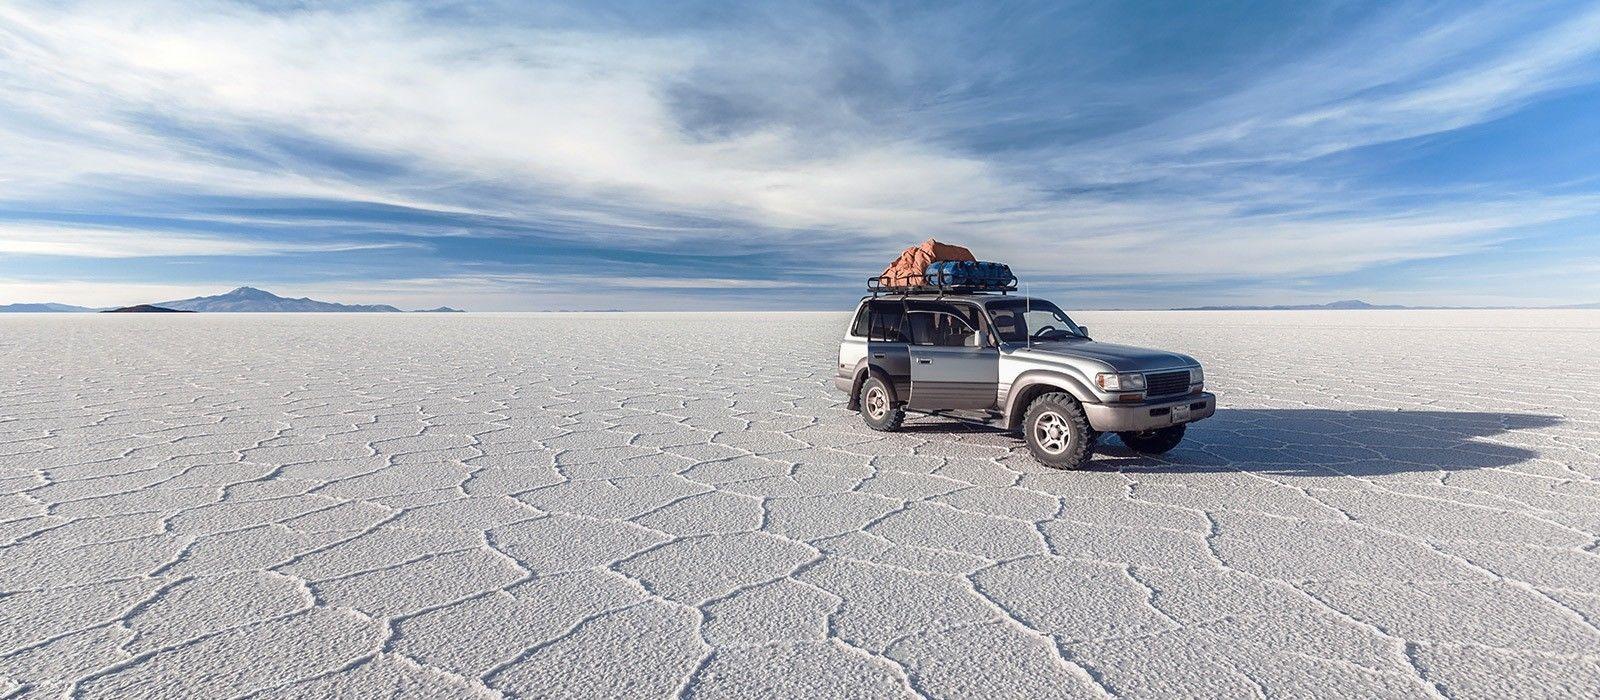 Destination Uyuni Bolivia